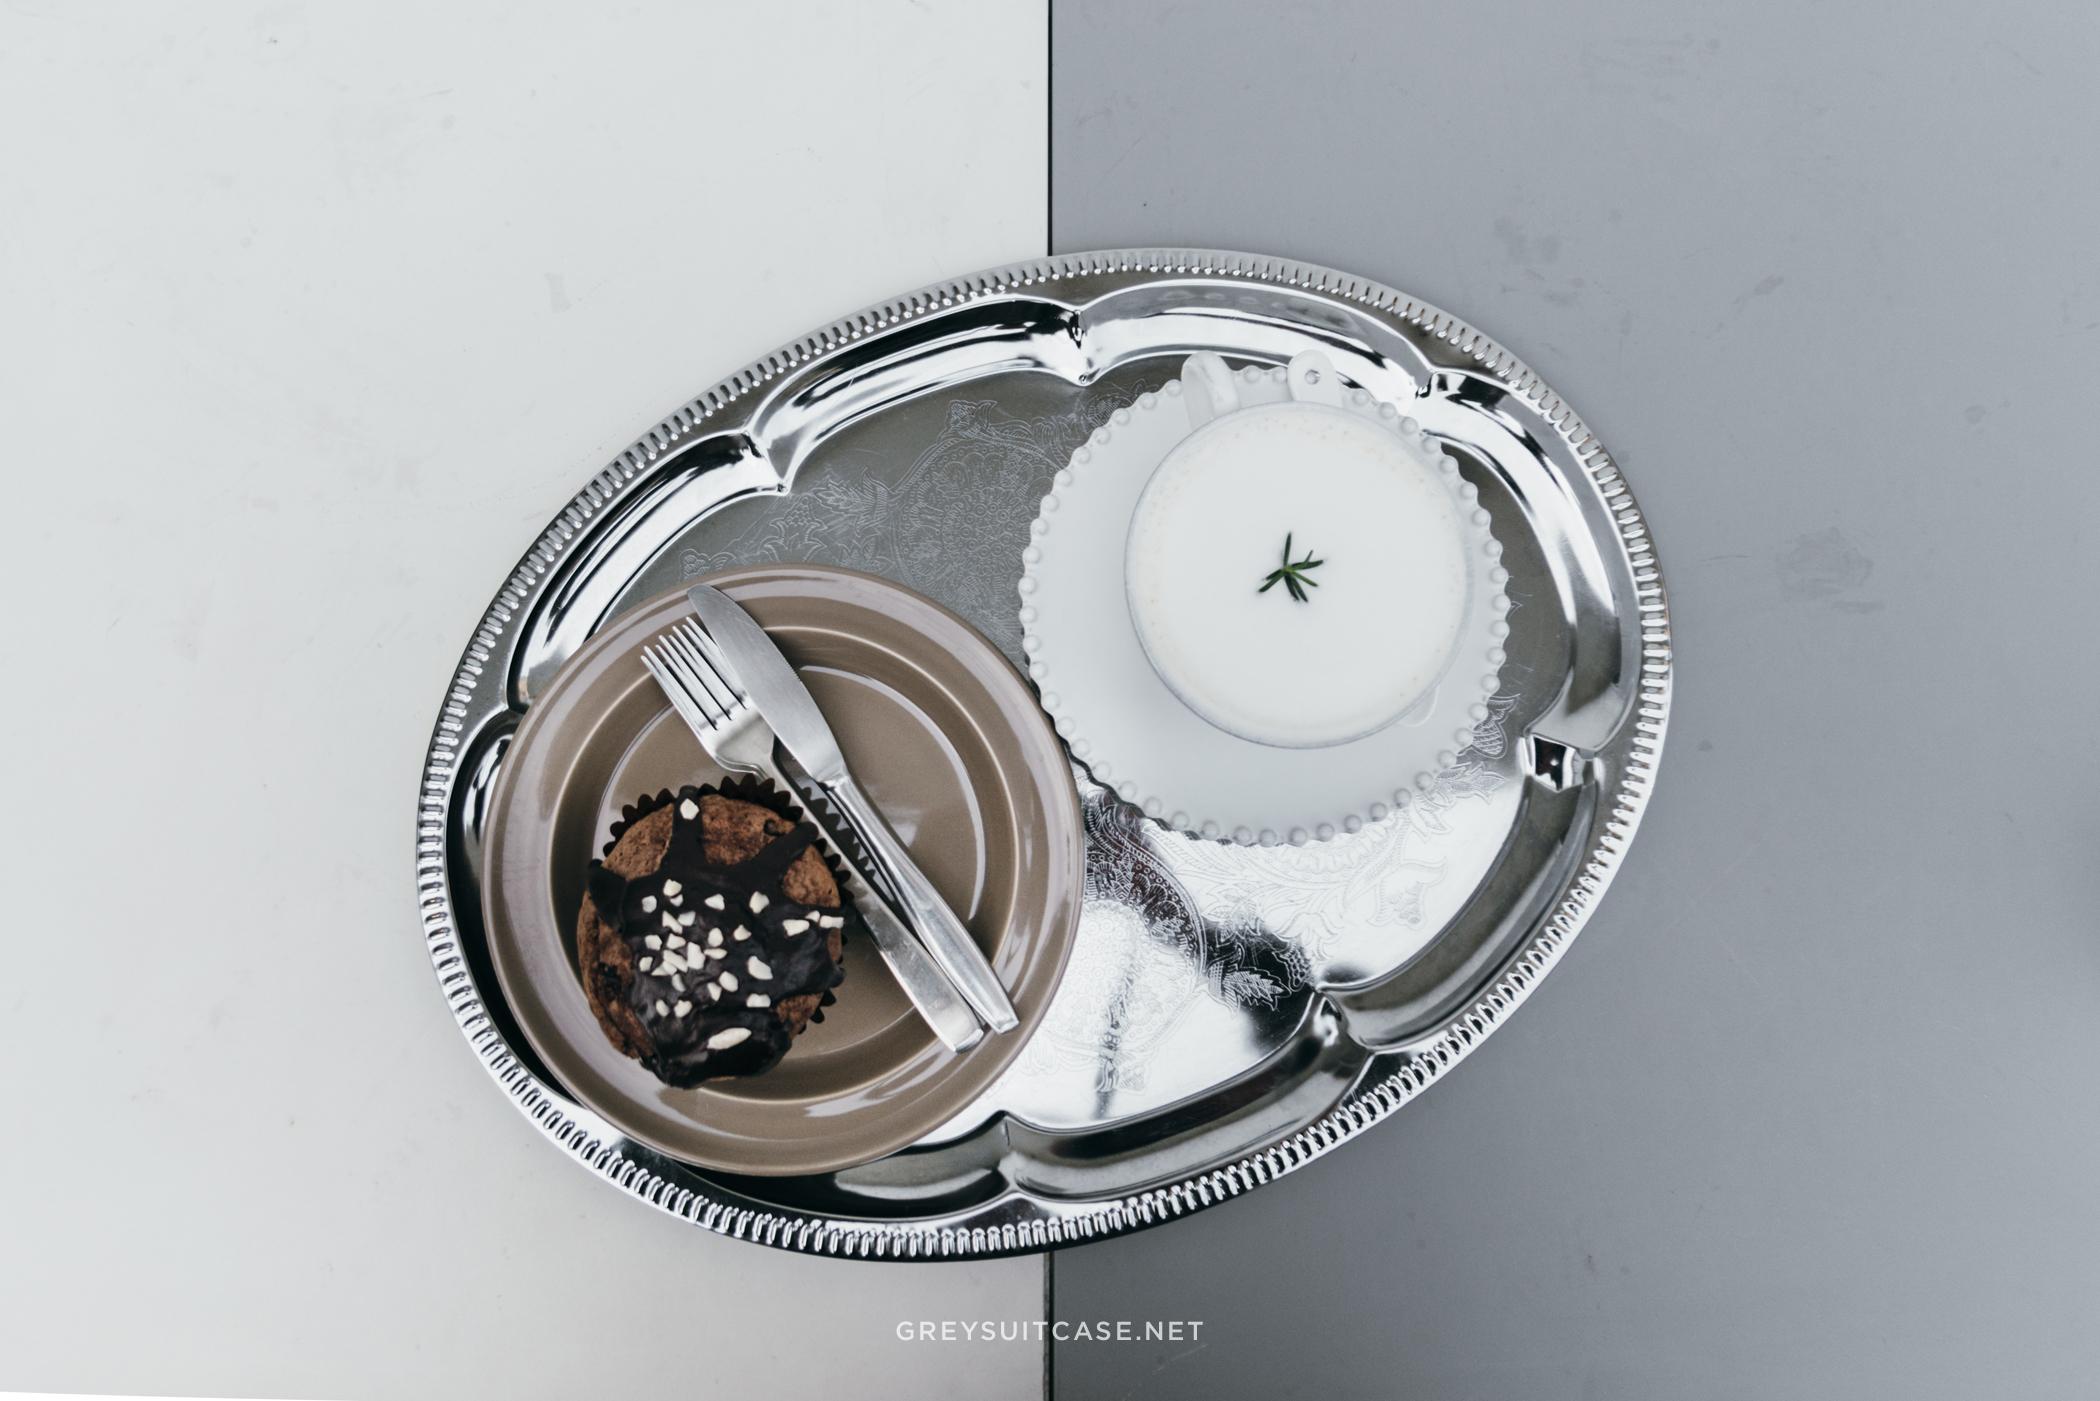 Greysuitcase Seoul Cafe Series: Maison de Sculp (메종드스컬프), Hapjeong (합정), Seoul, South Korea.